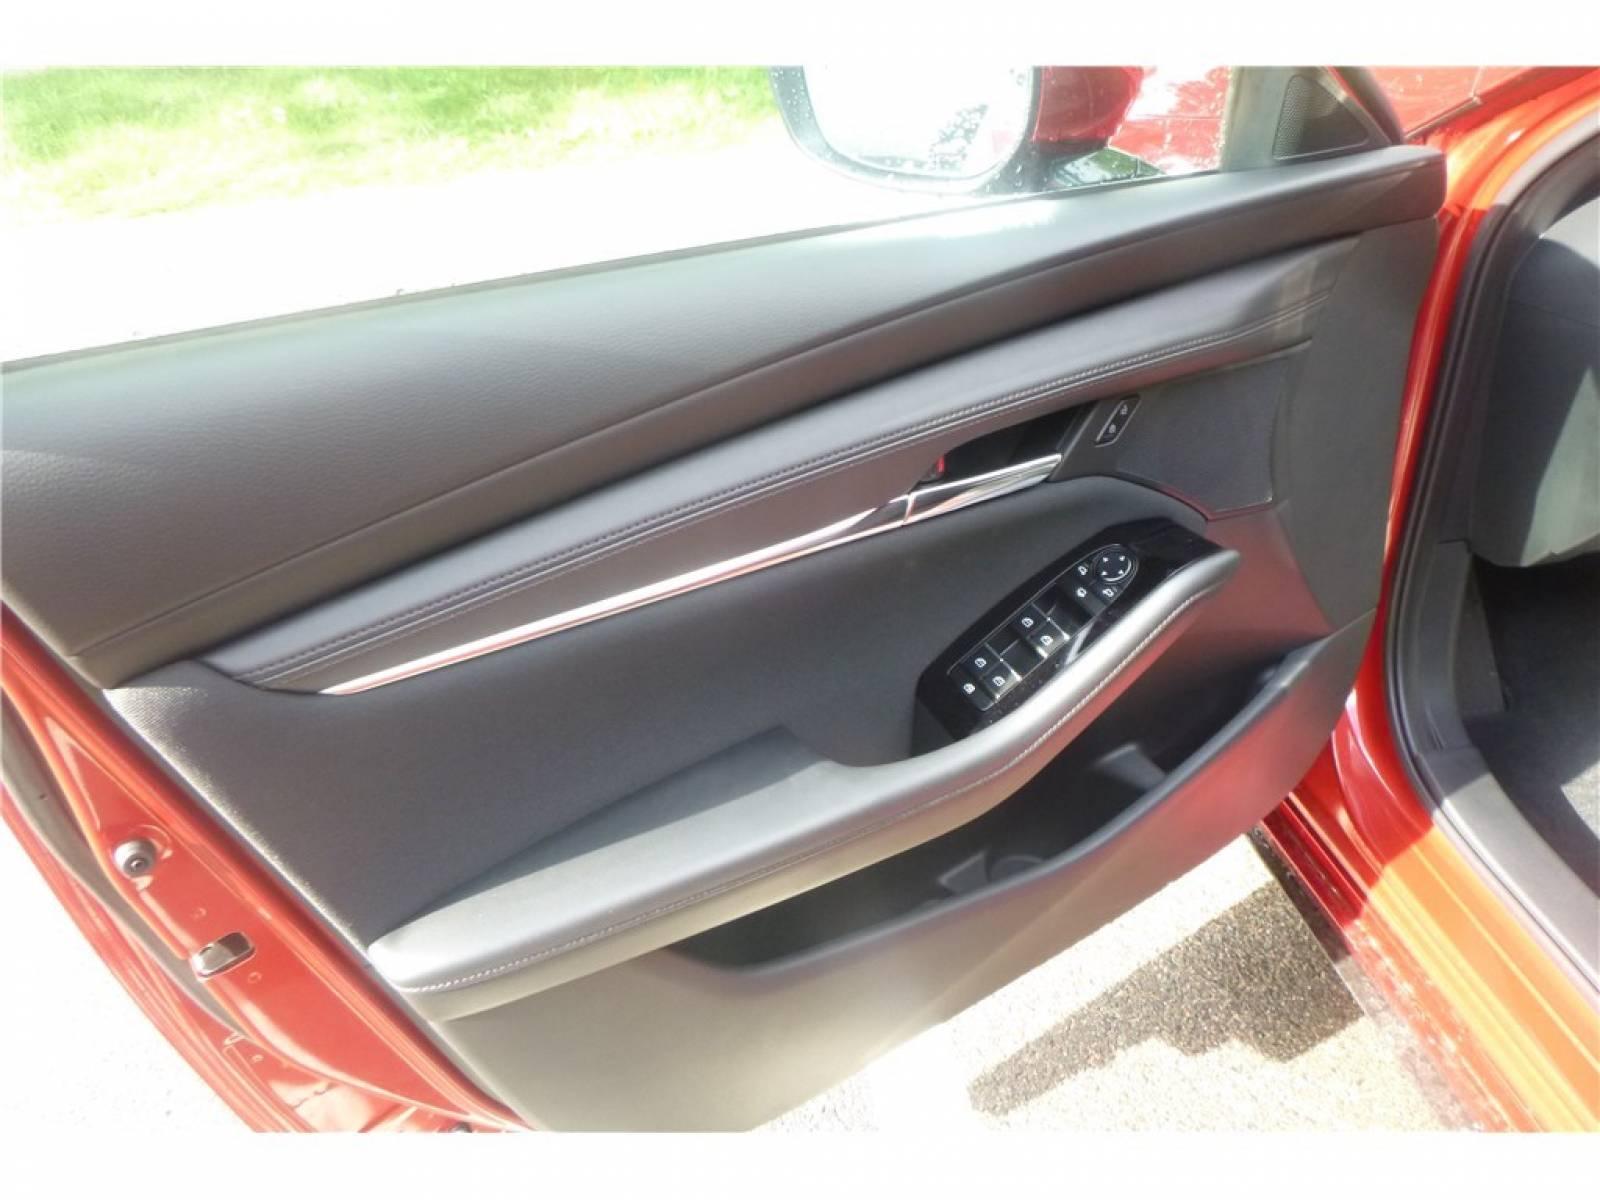 MAZDA Mazda3 5 portes 2.0L e-SKYACTIV-G M Hybrid 122 ch BVA6 - véhicule d'occasion - Groupe Guillet - Chalon Automobiles - 71100 - Chalon-sur-Saône - 10